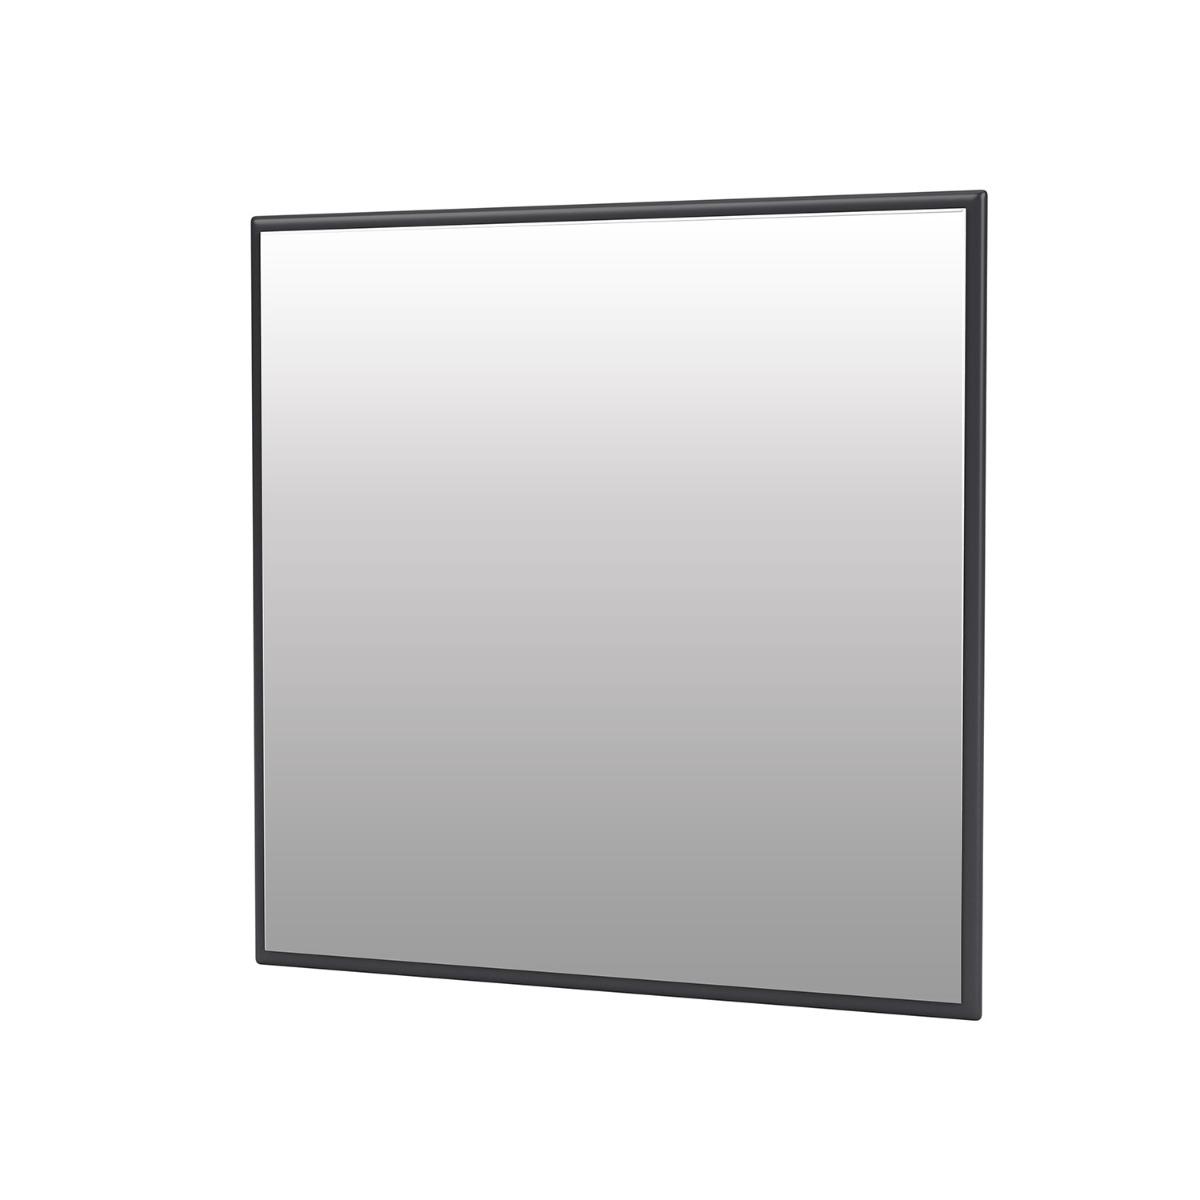 Montana Mini Spegel Fyrkantig 35x35 cm Anthracite